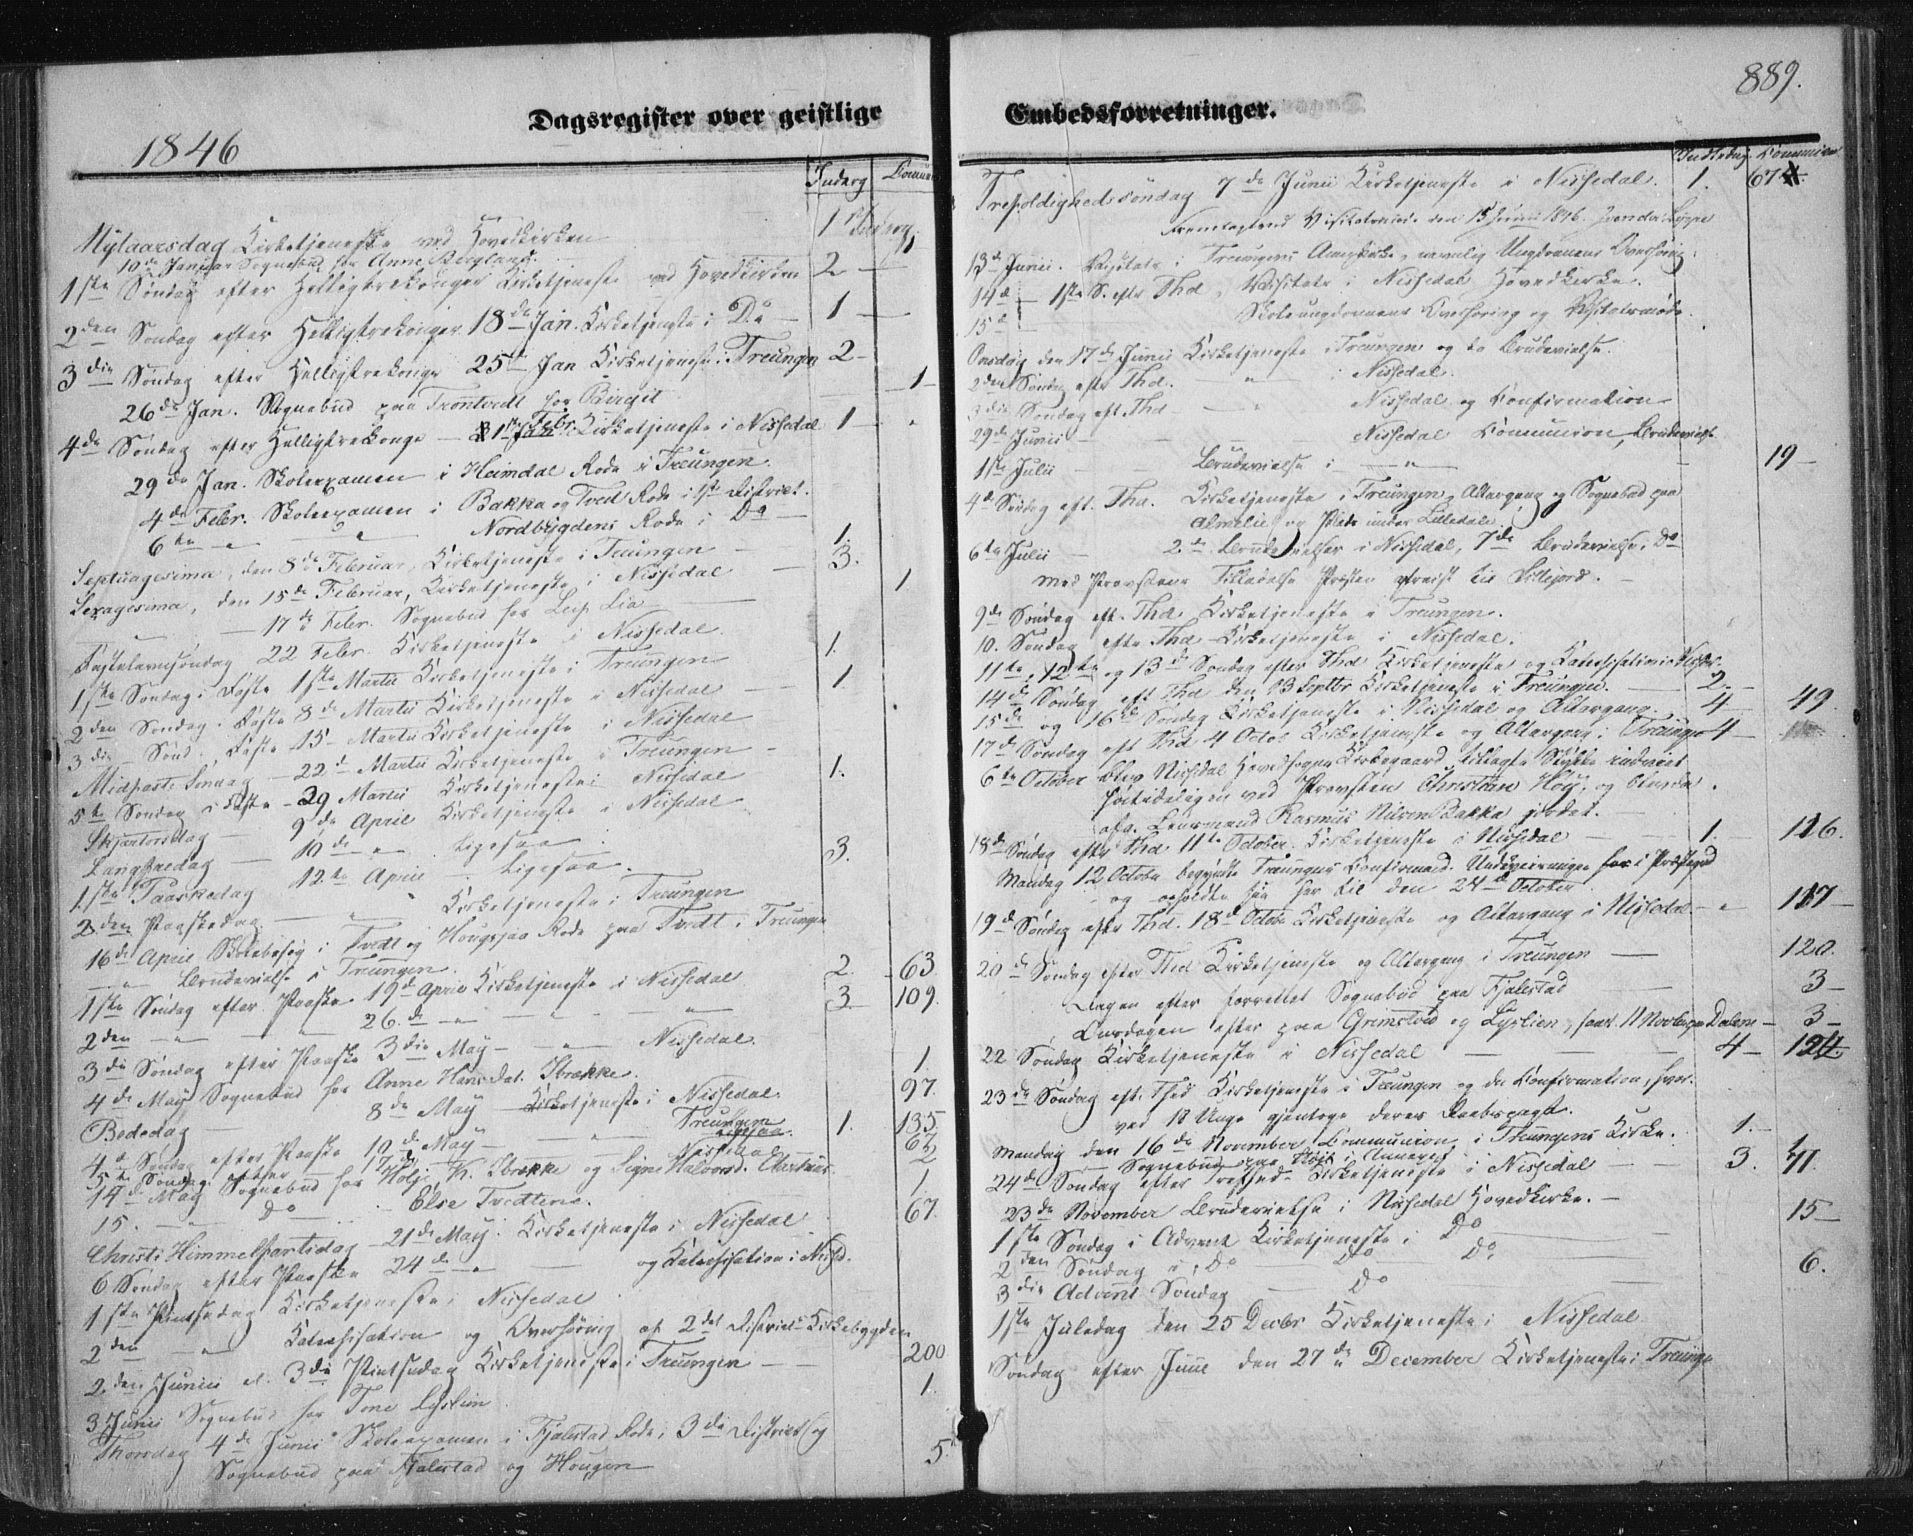 SAKO, Nissedal kirkebøker, F/Fa/L0003: Ministerialbok nr. I 3, 1846-1870, s. 888-889